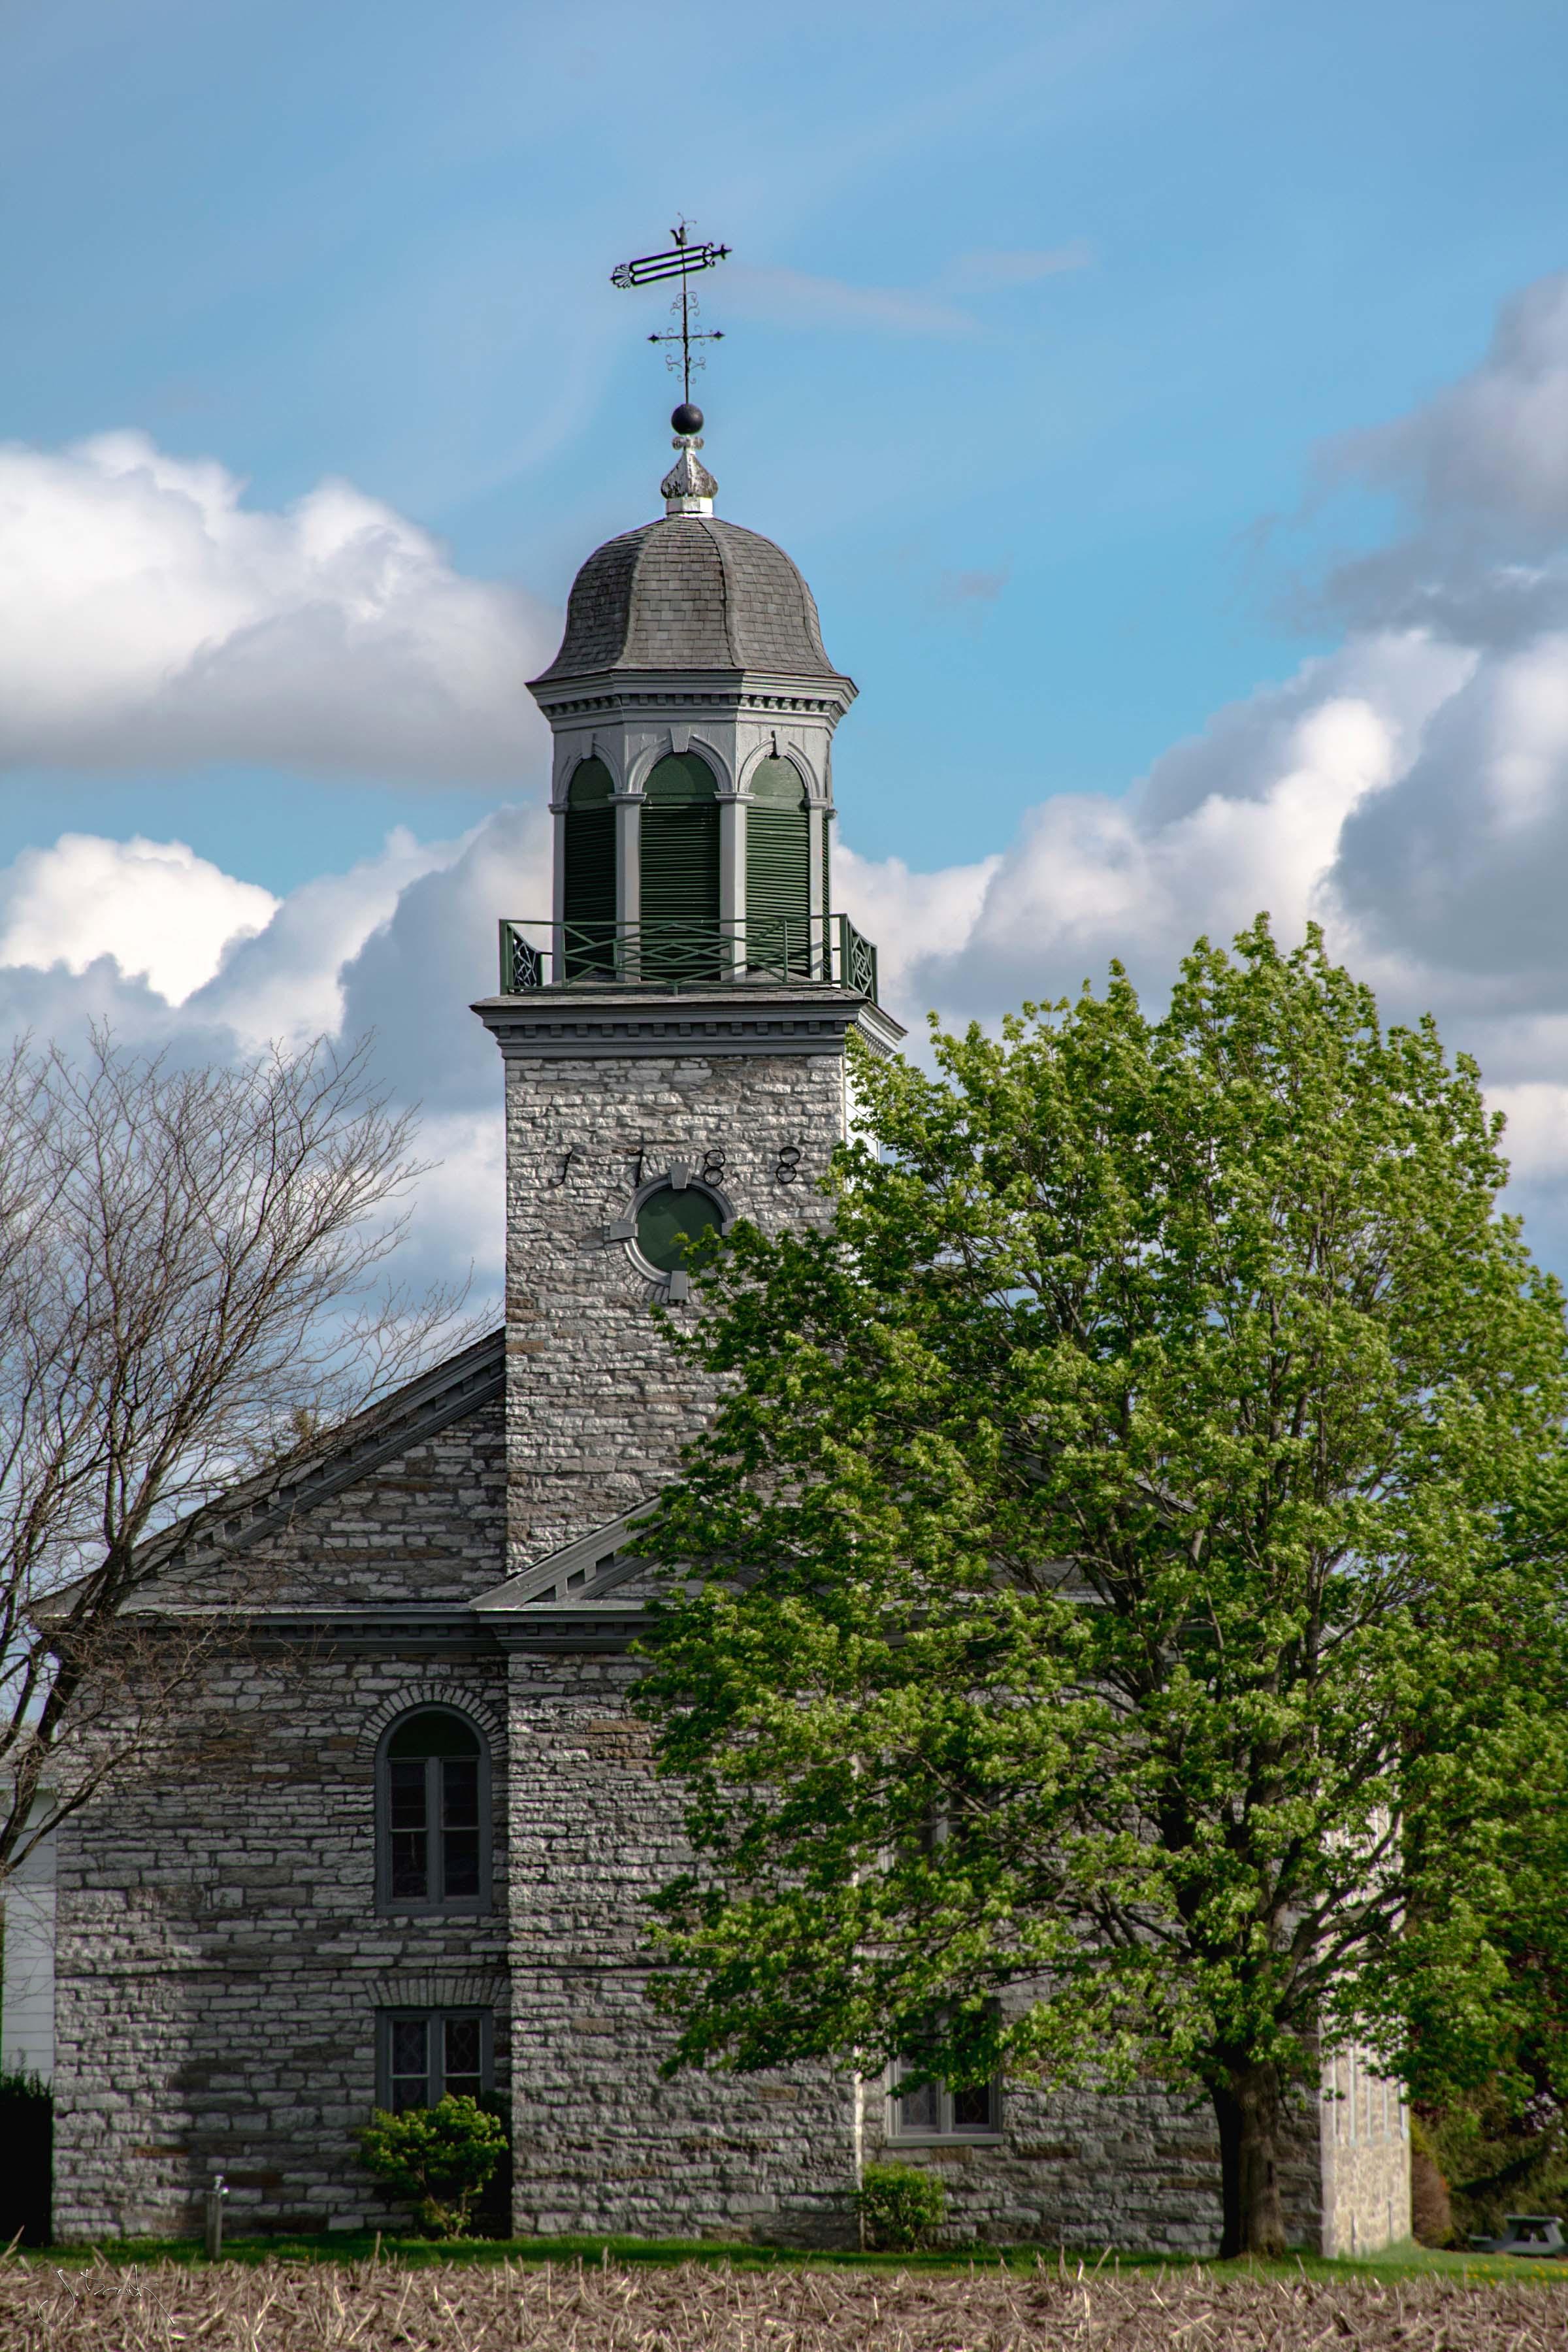 Stone Church 5813 8x12 300ppi.jpg